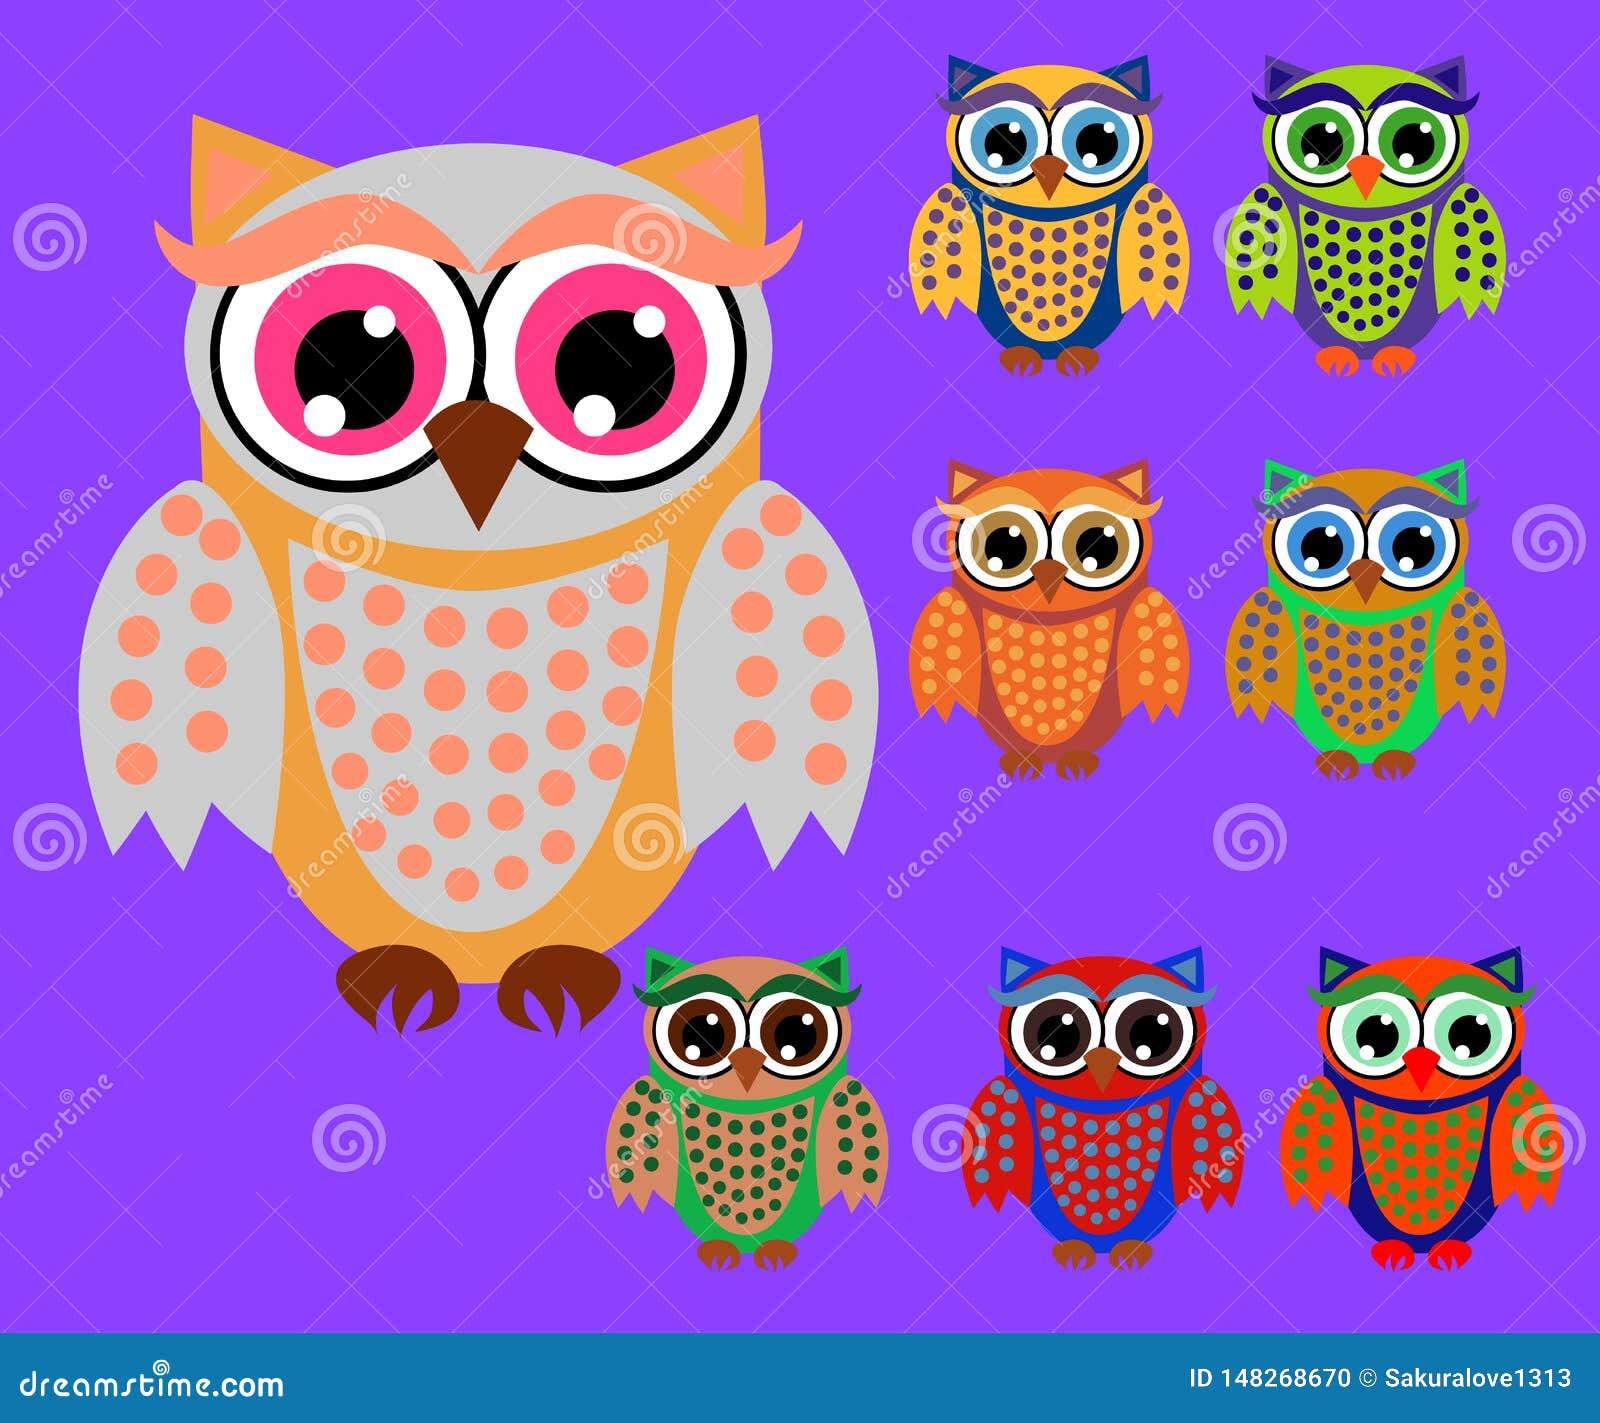 Cute cartoon owls set for baby showers, birthdays and invitation designs